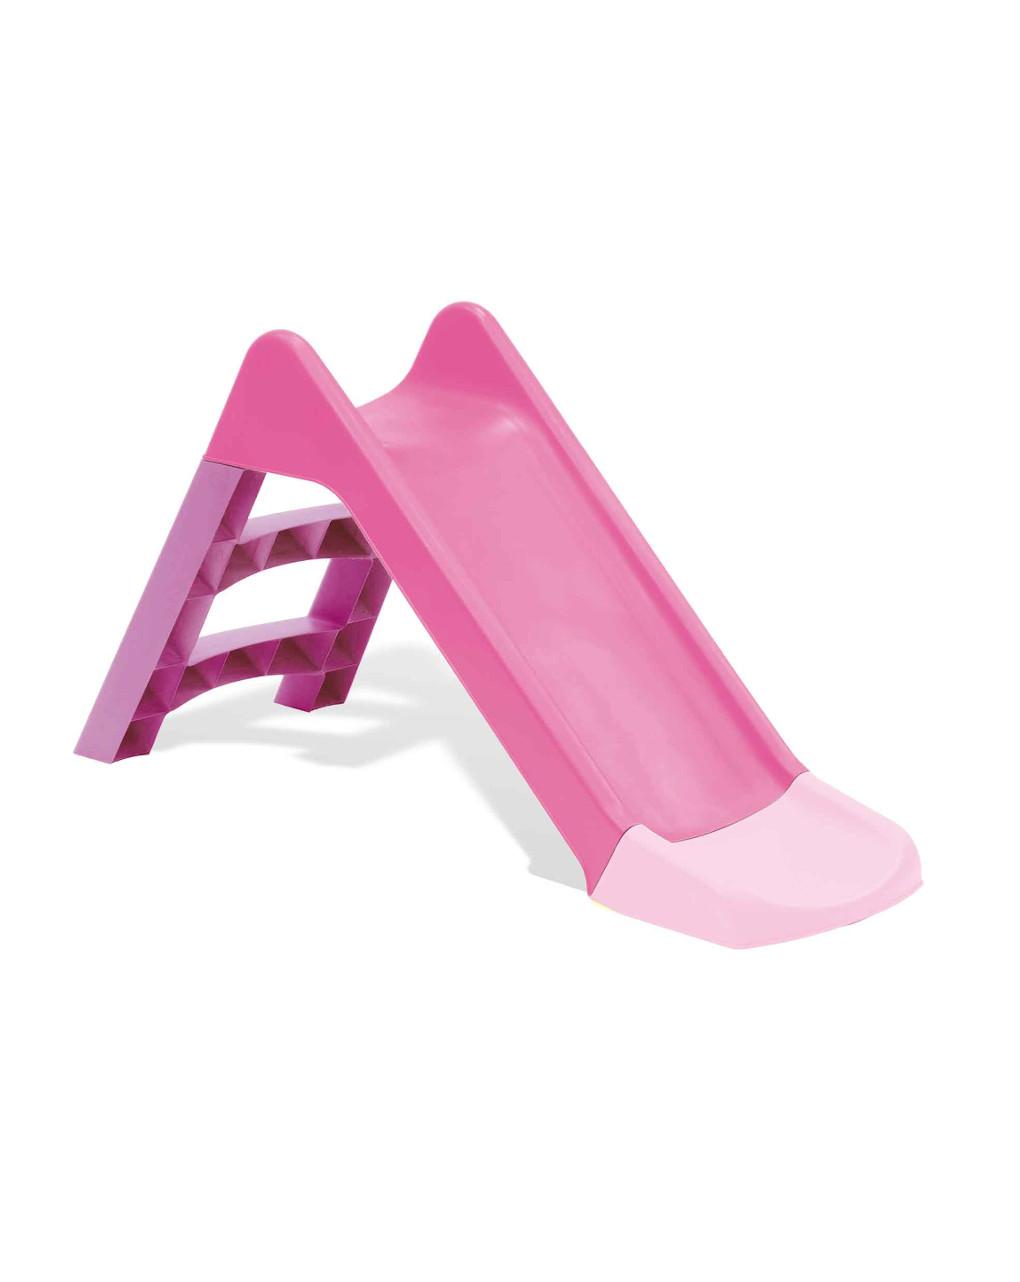 Sol e esporte - slide rosa de 3 etapas - Sun&Sport